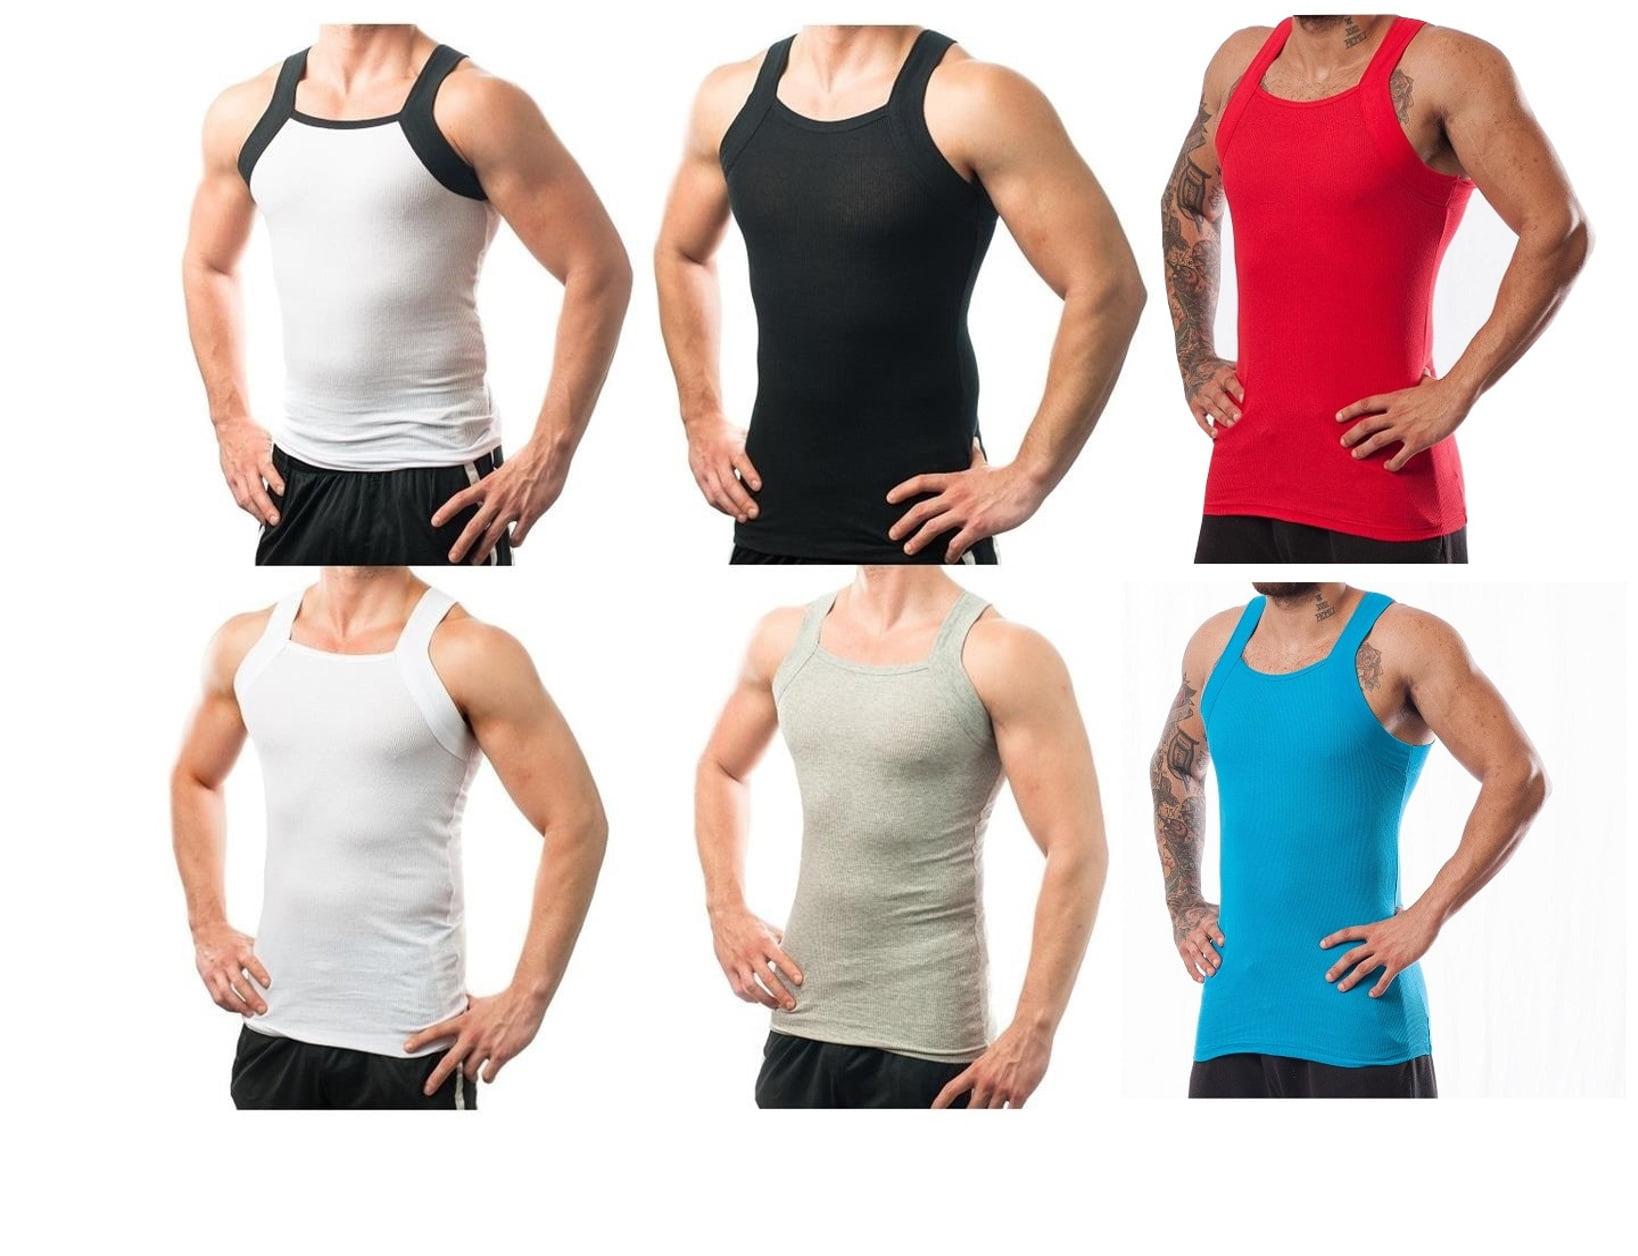 b745fe62b4e08 Different Touch - 6 Pack Men s G-Unit Style Square Cut Underwear Shirt Tank  tops A-shirts M - Walmart.com